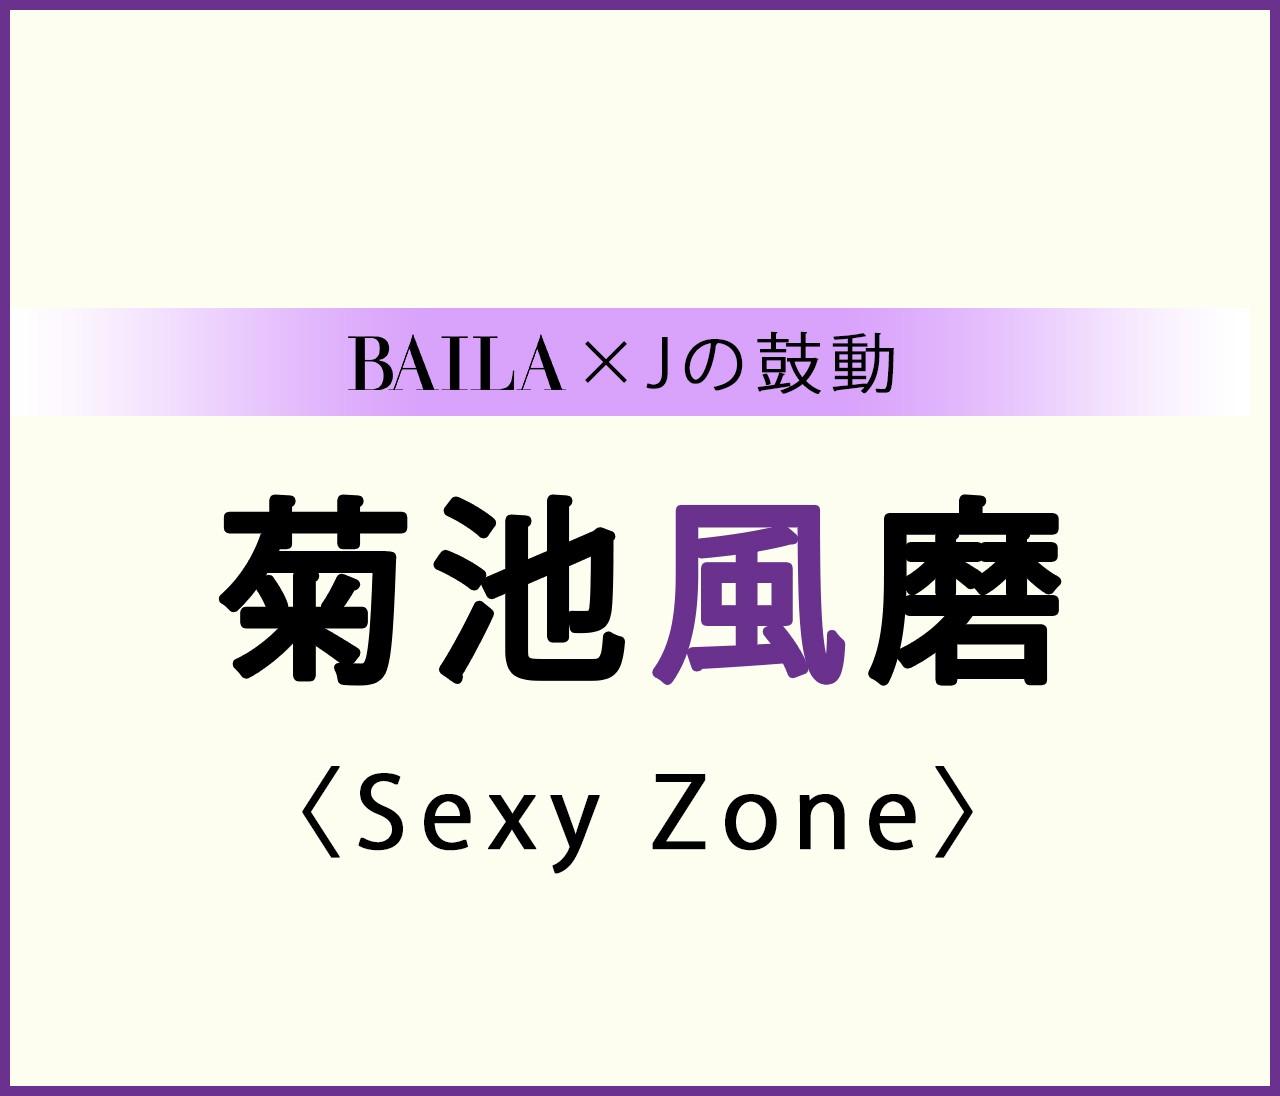 【Sexy Zone】菊池風磨スペシャルインタビュー!【BAILA × Jの鼓動】